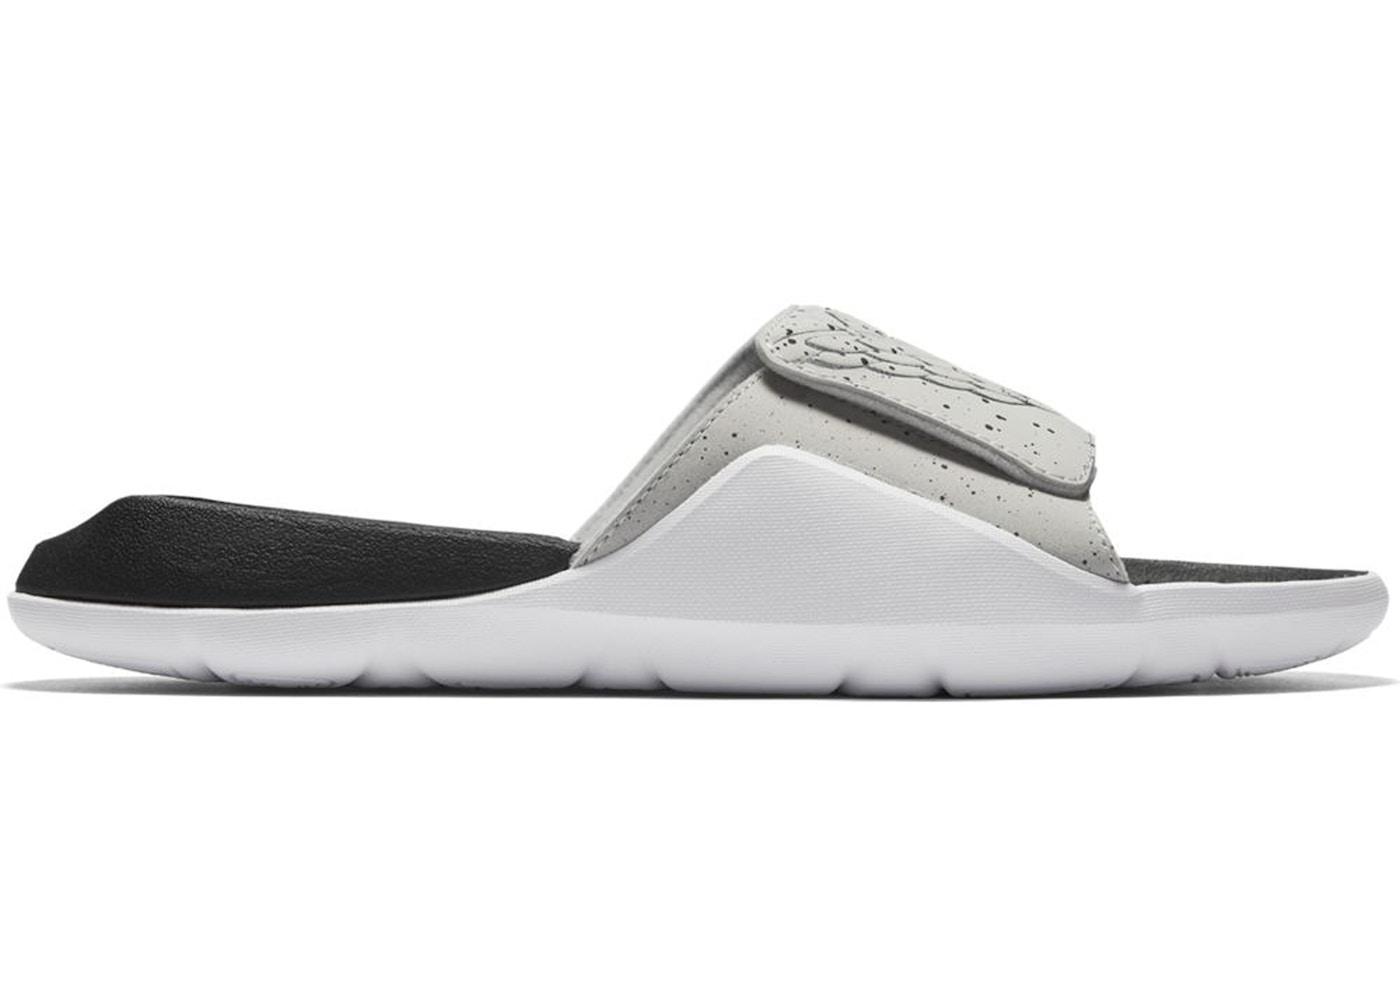 finest selection 49910 661f9 Jordan Hydro 7 White Cement